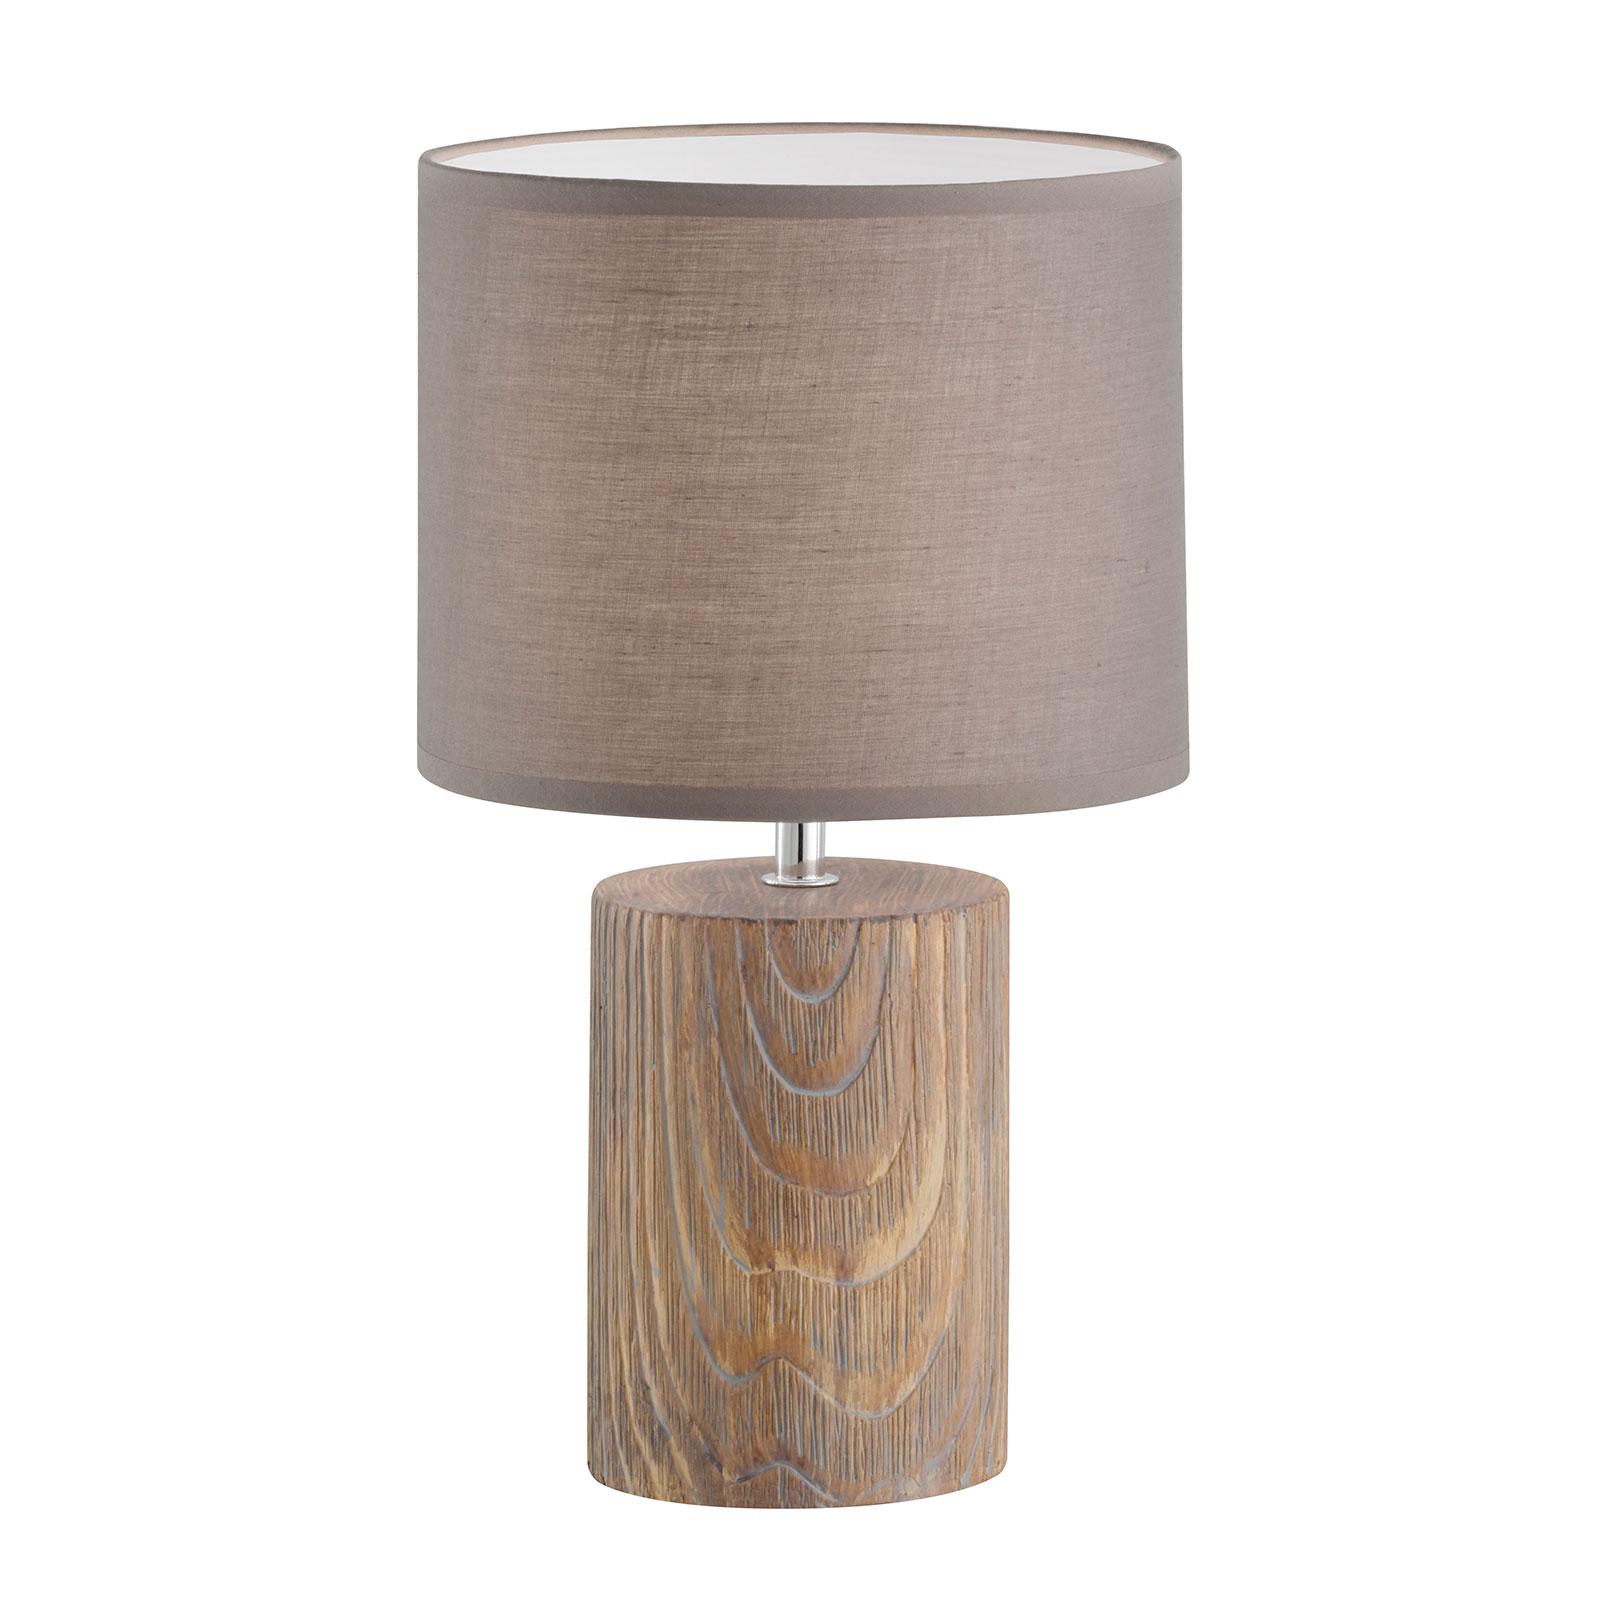 Tafellamp Malik in houtoptiek, 43 cm